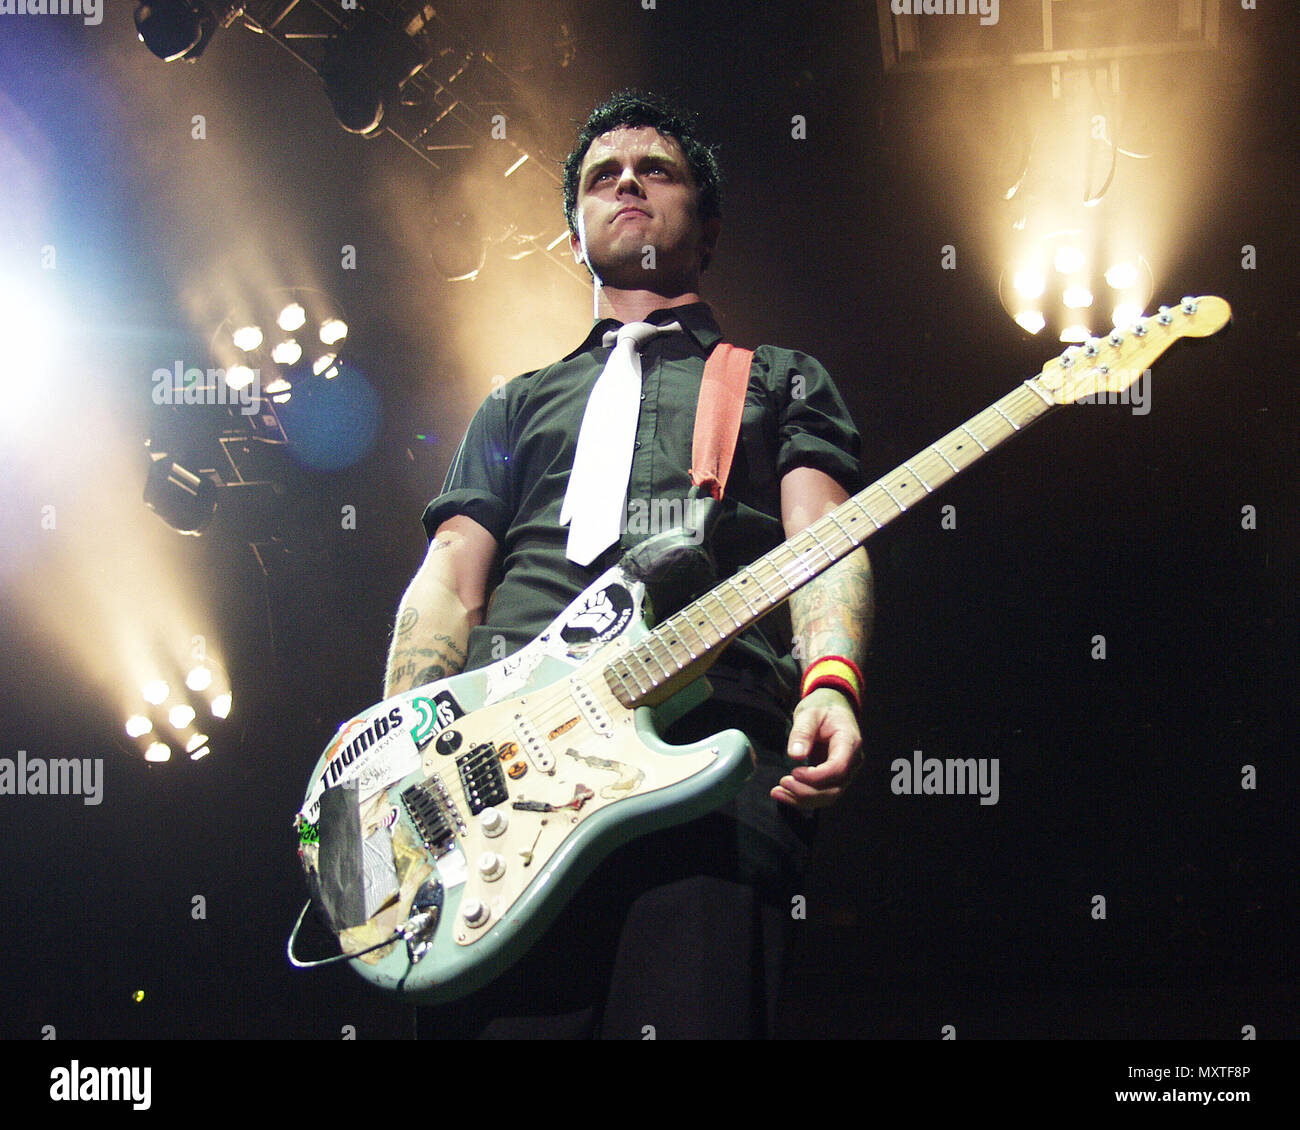 Atlanta Ga Mai 18 Billie Joe Armstrong Von Green Day Führt Bei